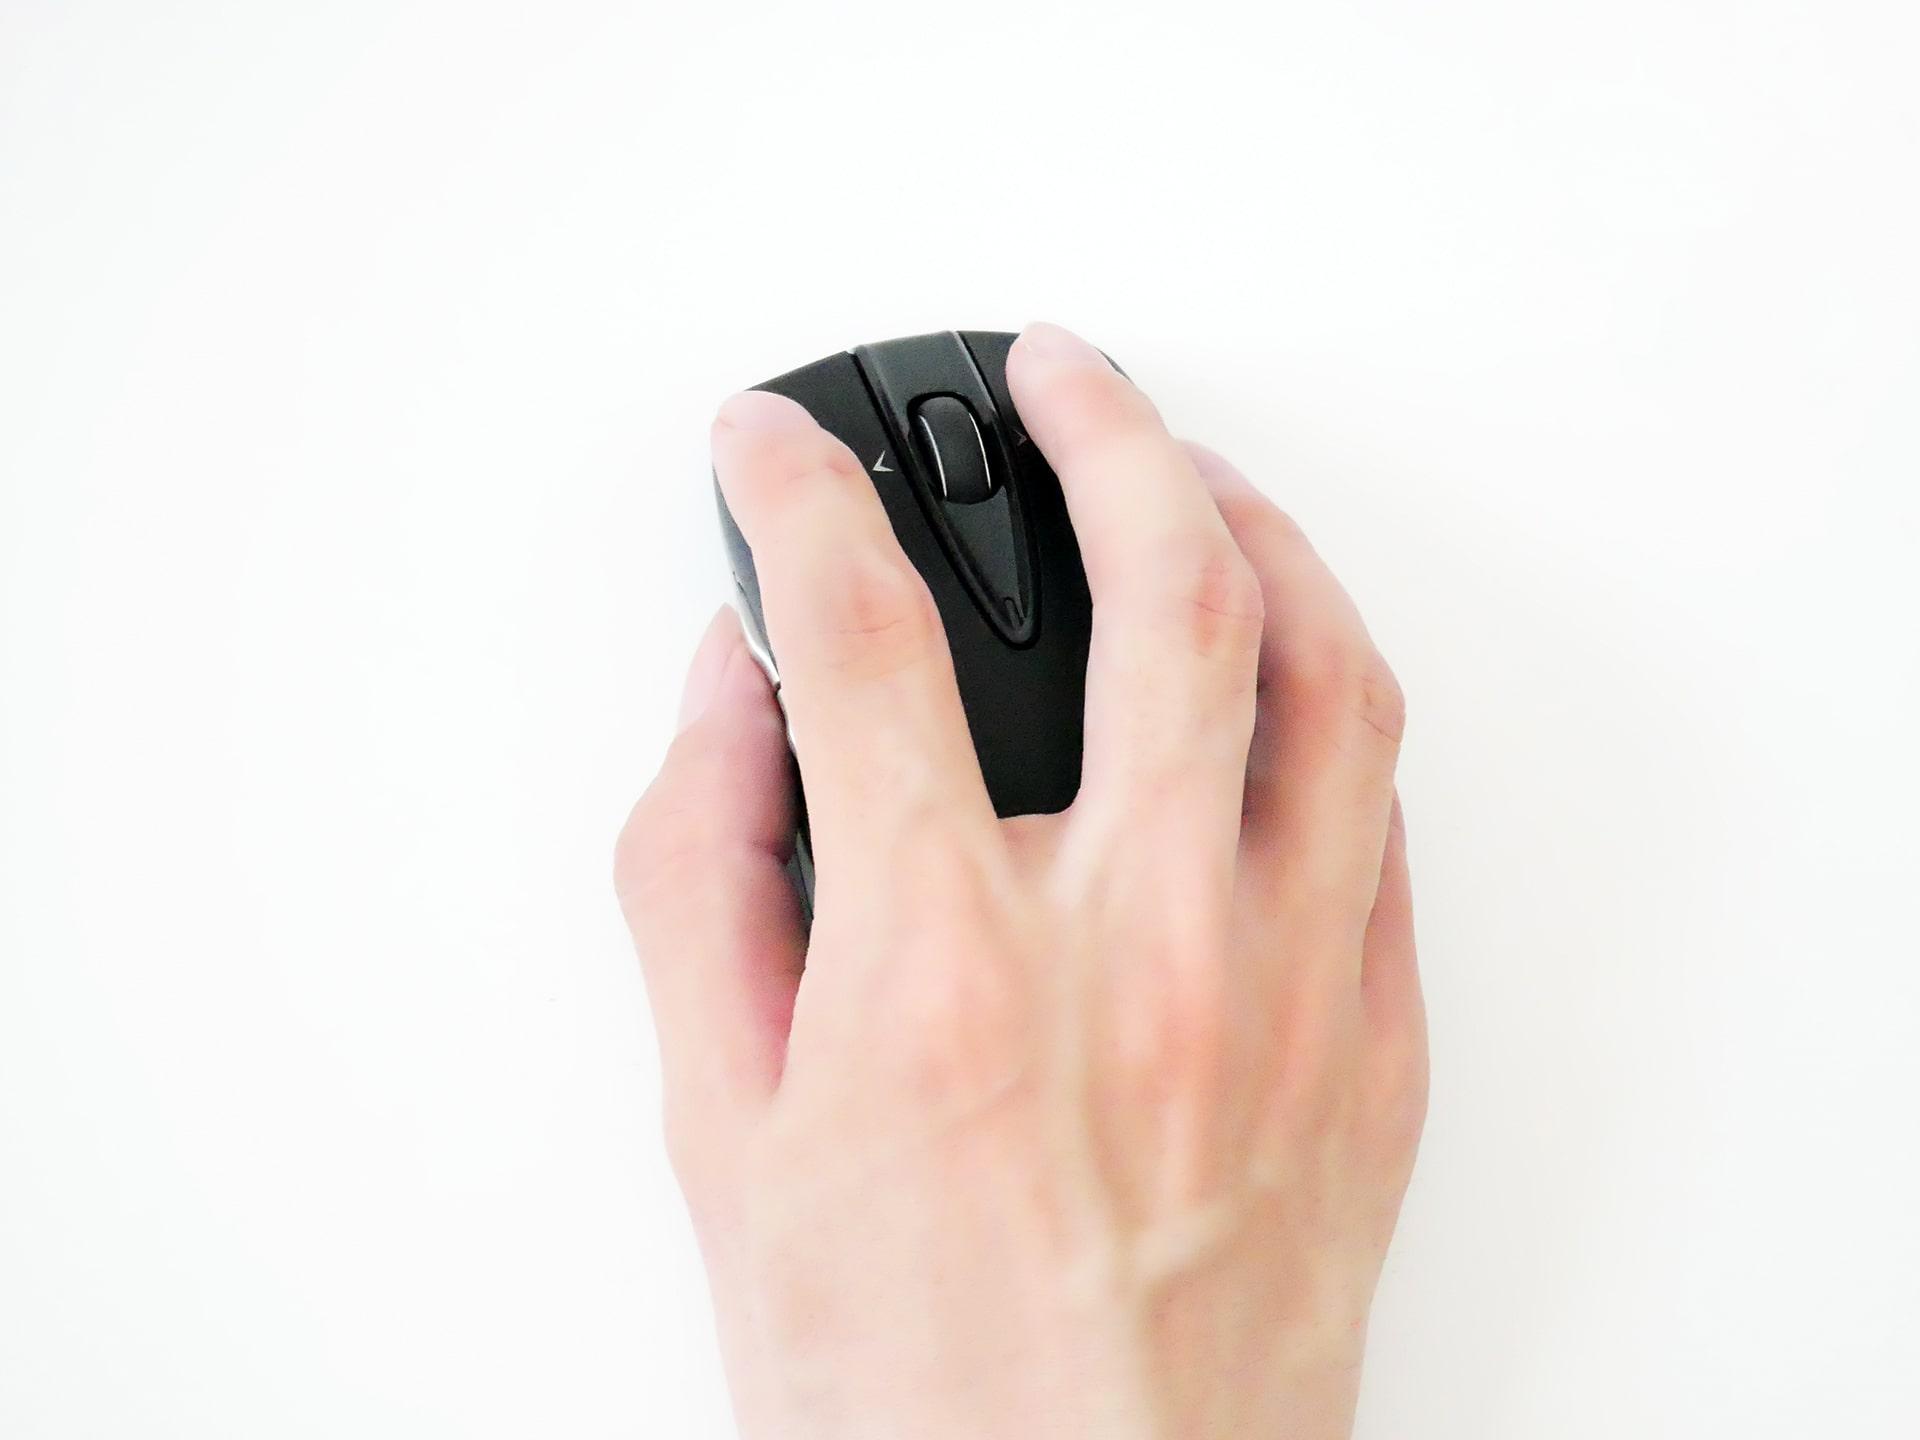 Logicool Wireless Mouse M546を手で持った状態の写真